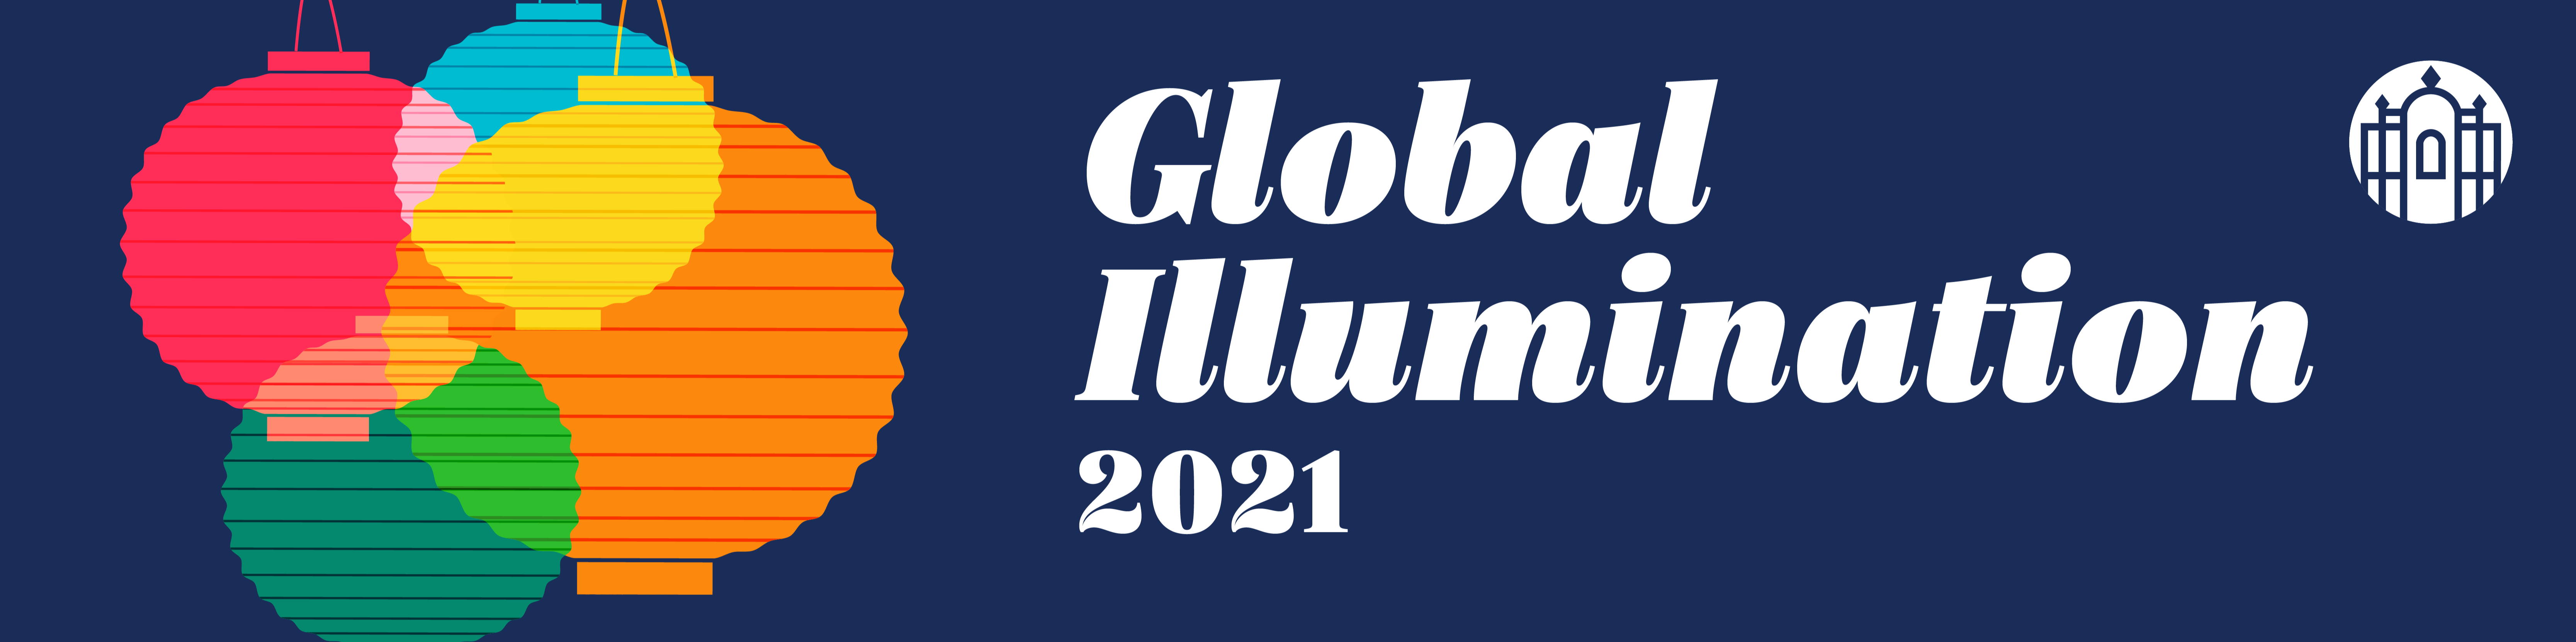 Smith College Global Illumination